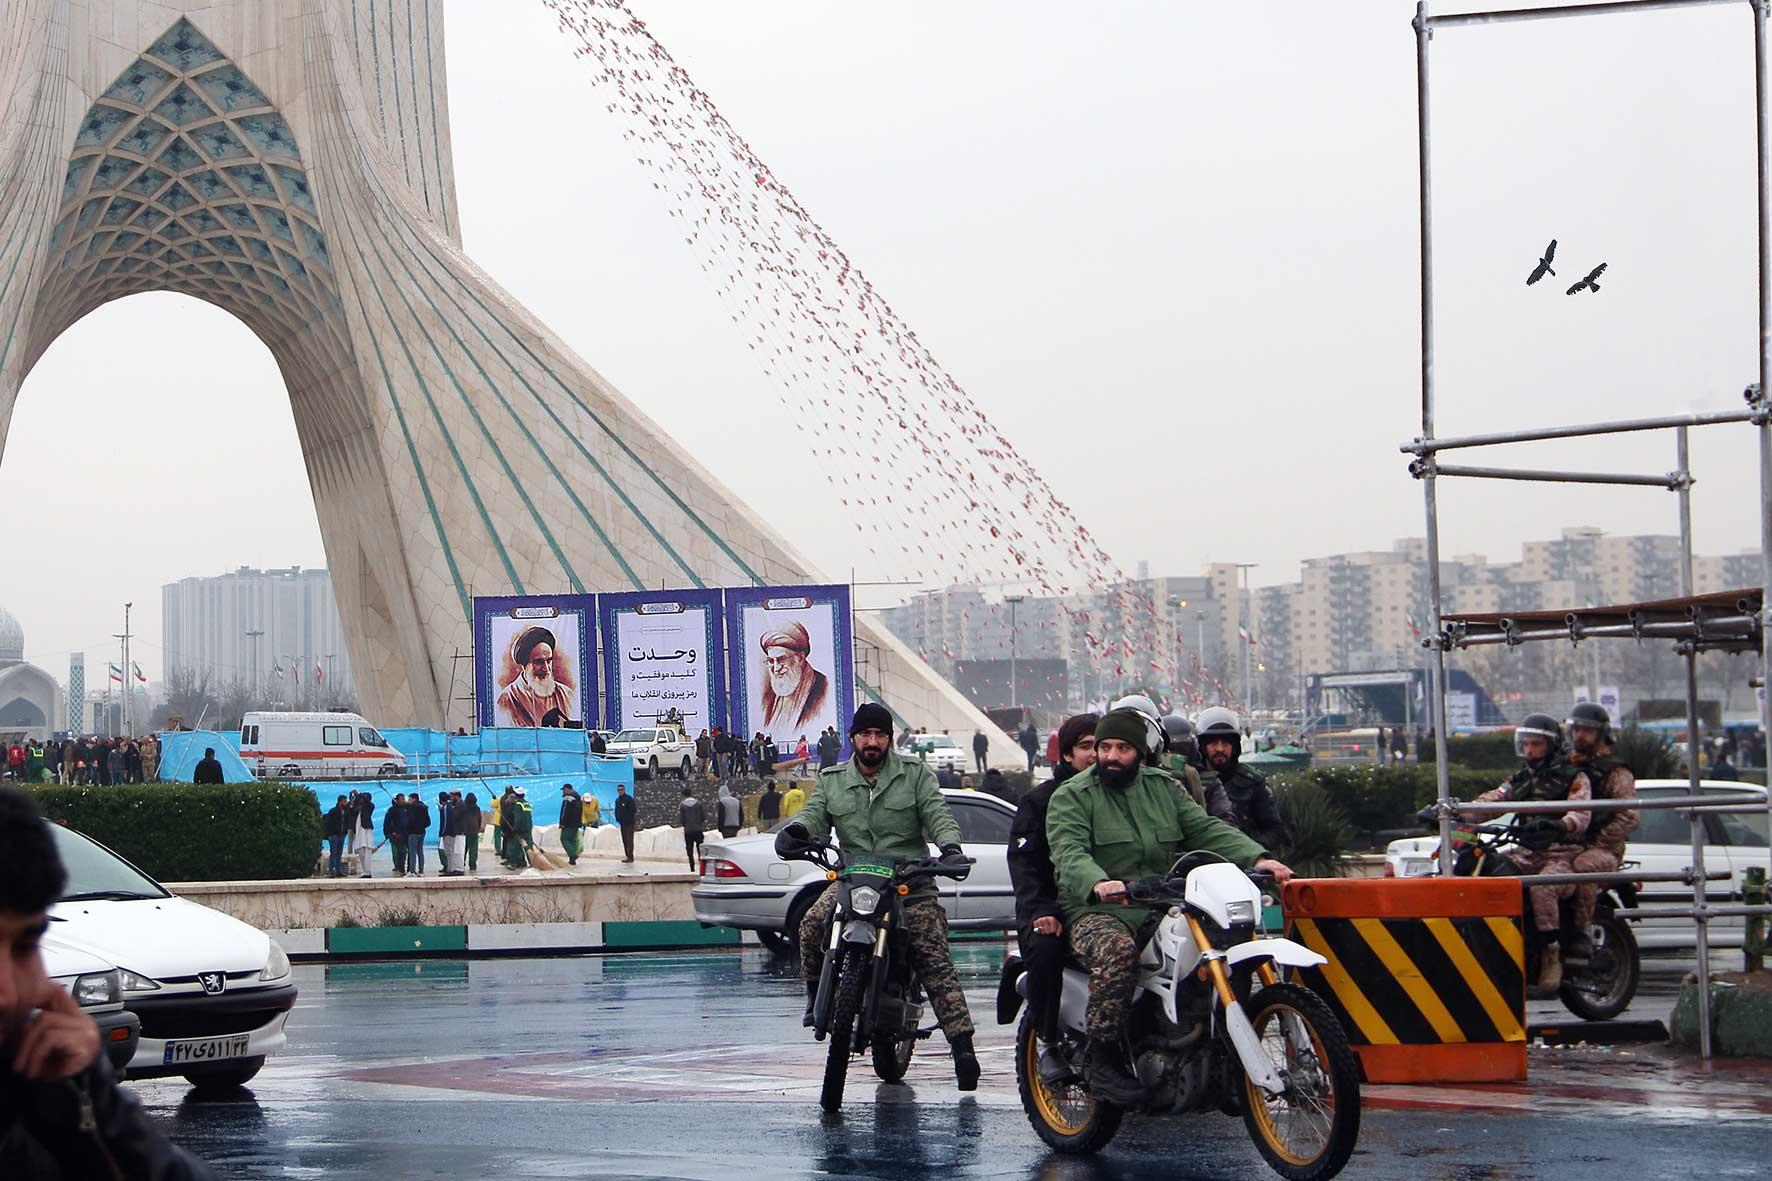 22 بهمن پلیس بسیج آزادی انقلاب سیاسی شاه پهلوی فرح